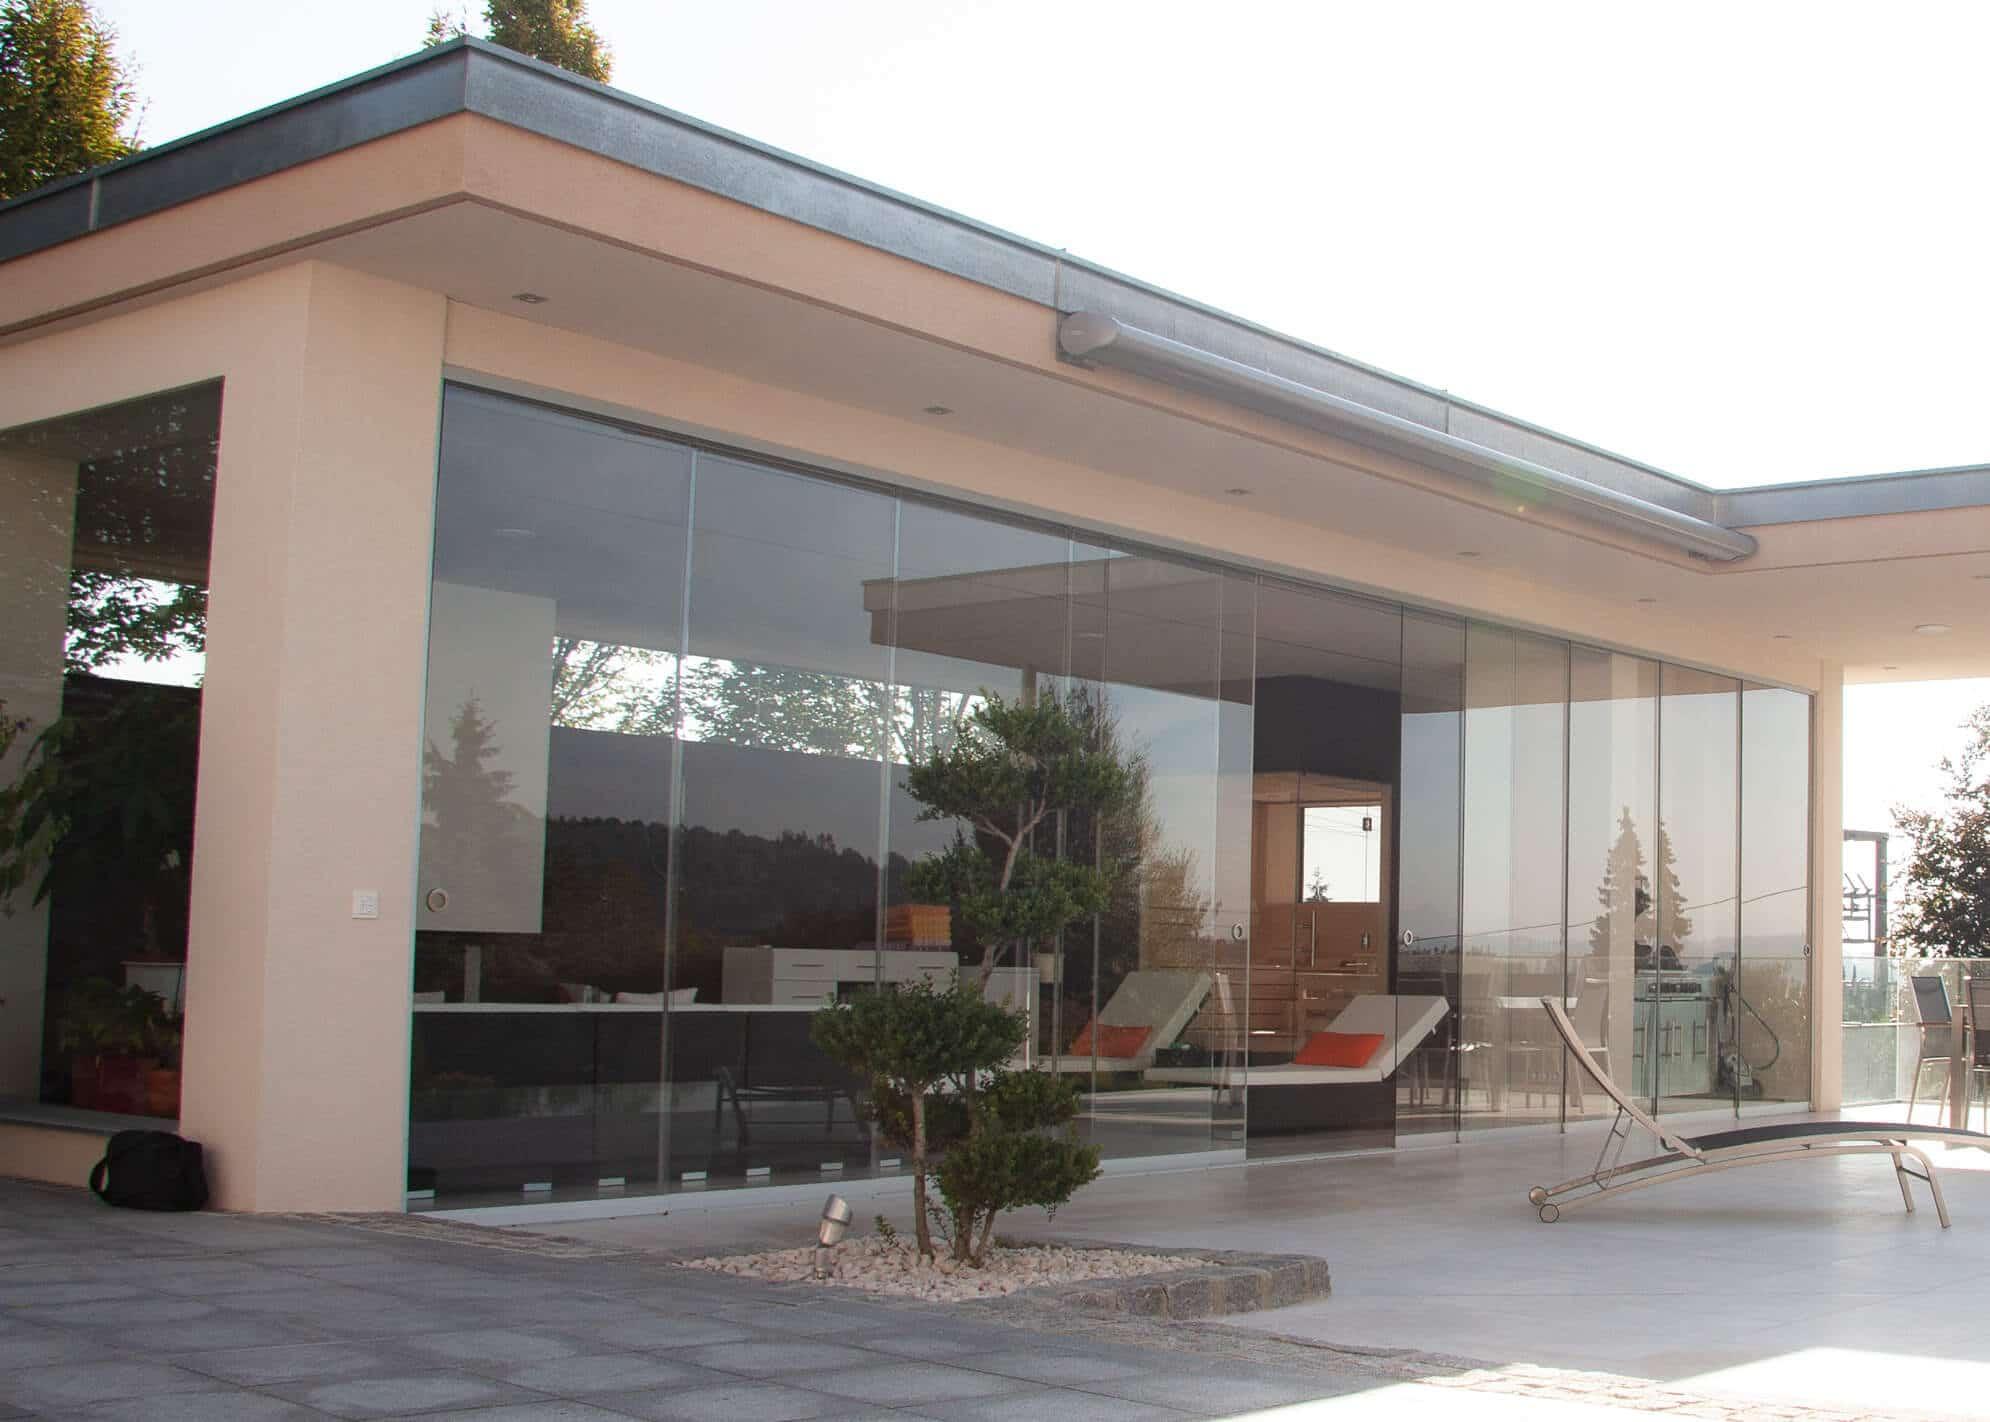 Full Size of Rahmenlose Fenster Photovoltaikfassade Baumann Glas 1886 Gmbh Bauhaus Wohnzimmer Bauhaus Küchenrückwand